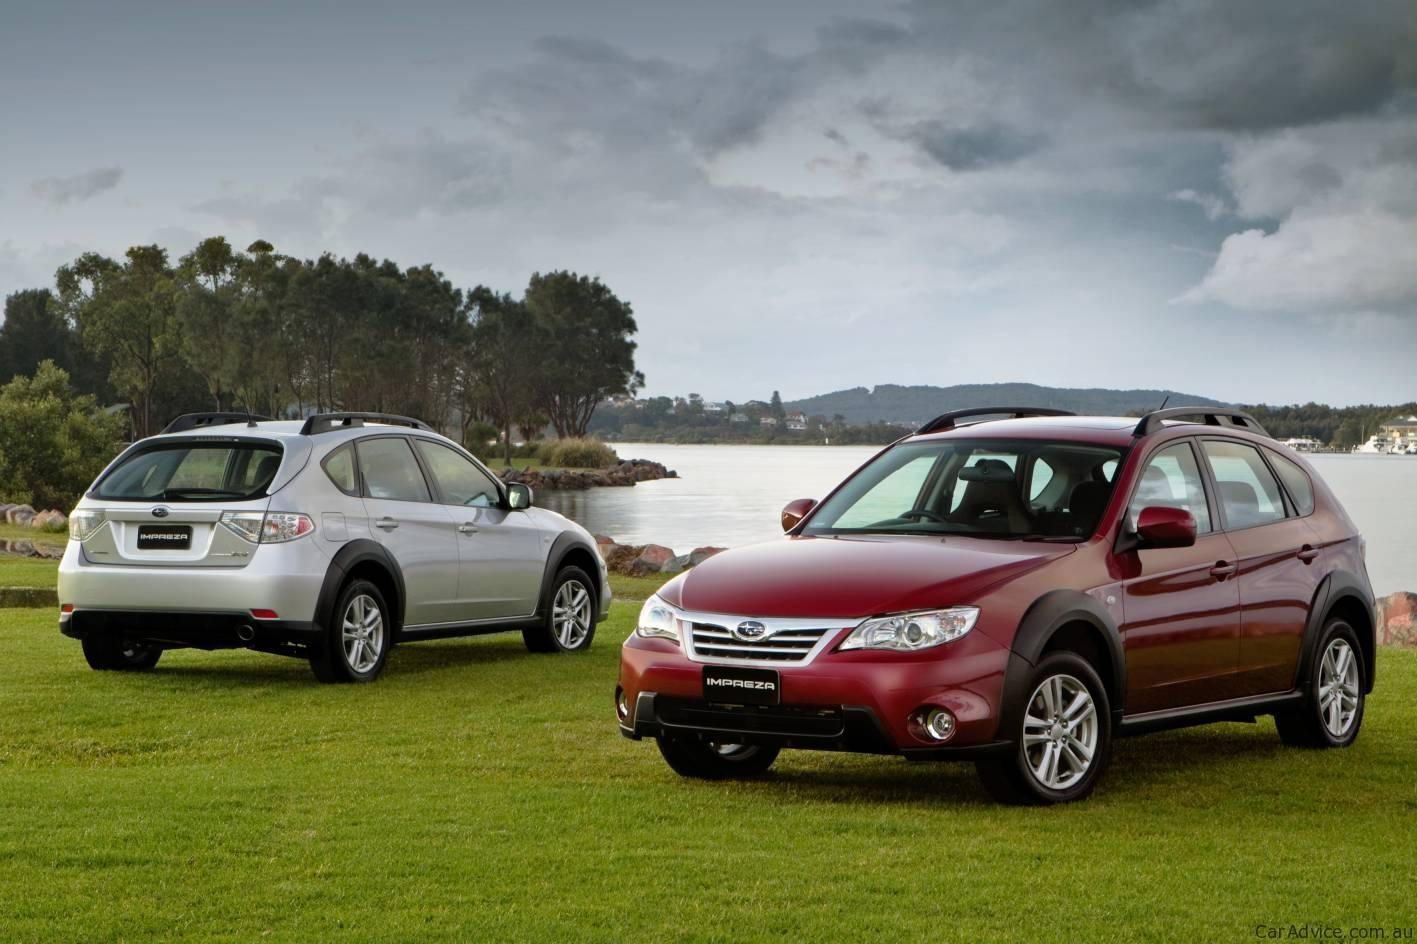 2010 Subaru Impreza Xv Launched In Australia Photos